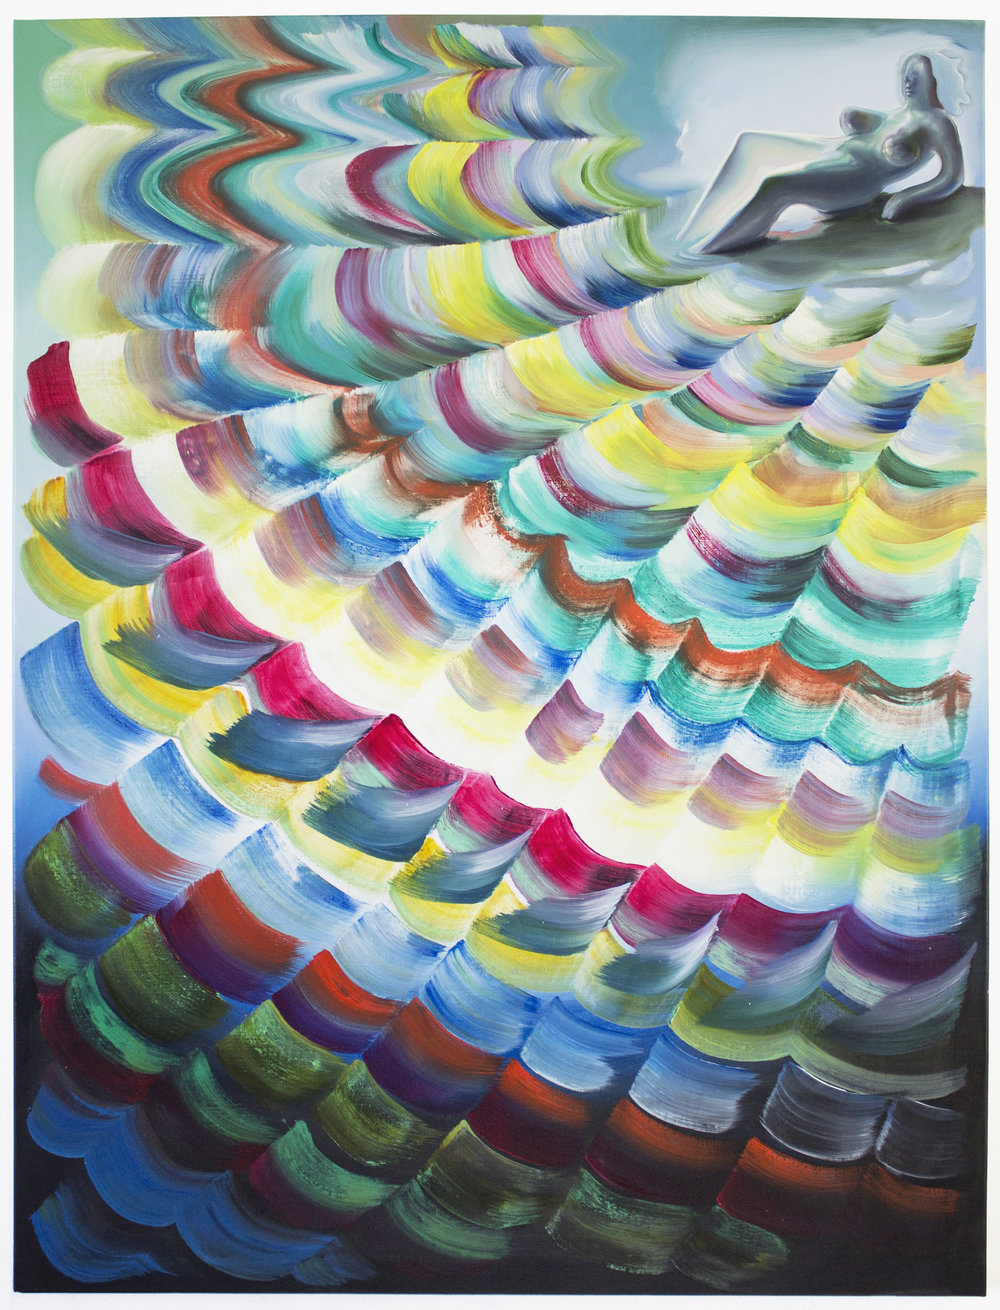 Lauren Satlowski  Wave Painting 08, 2017 oil on canvas 36 x 48 x 4 in.